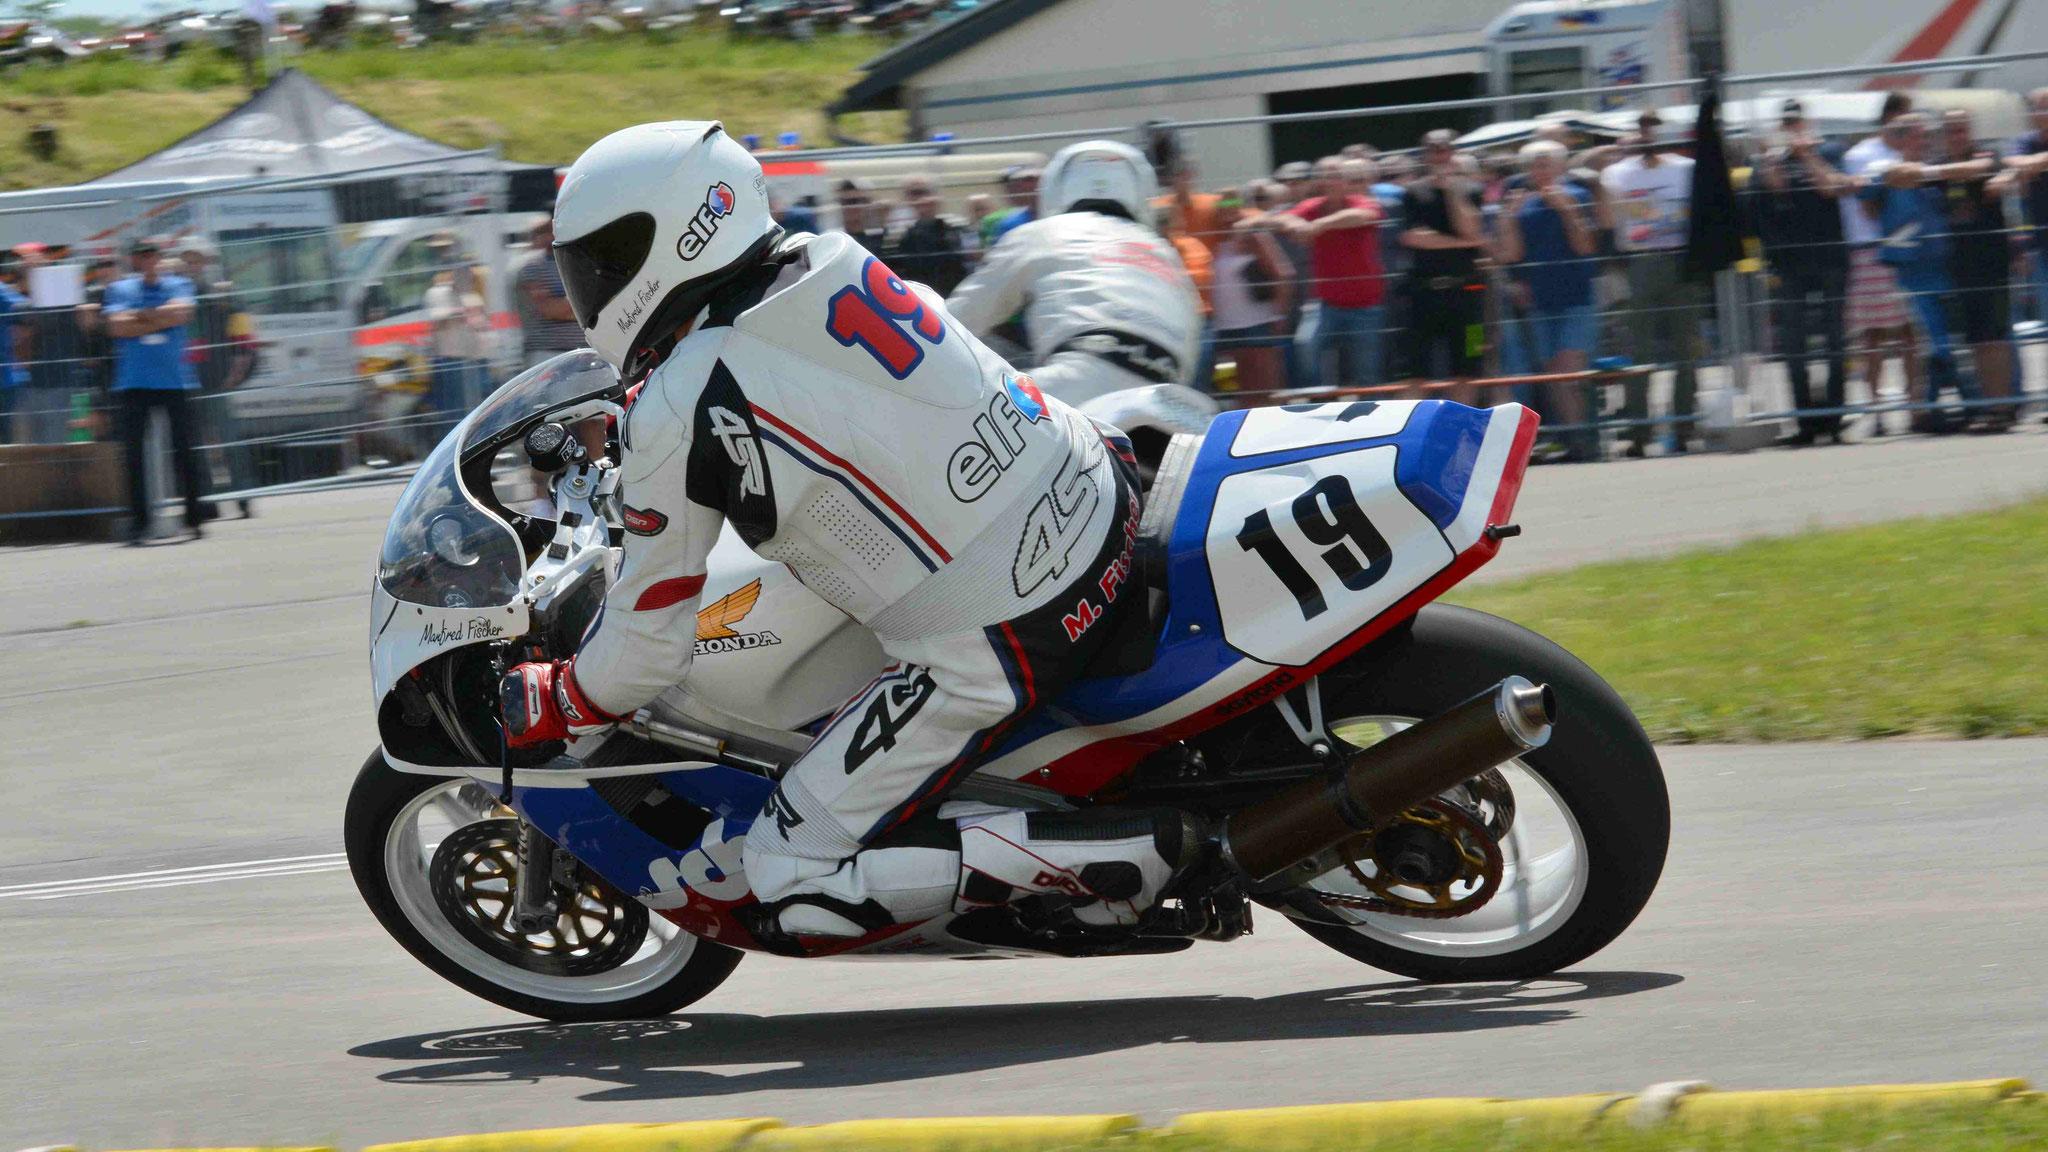 Manfred Fischer / Honda RC30 1988